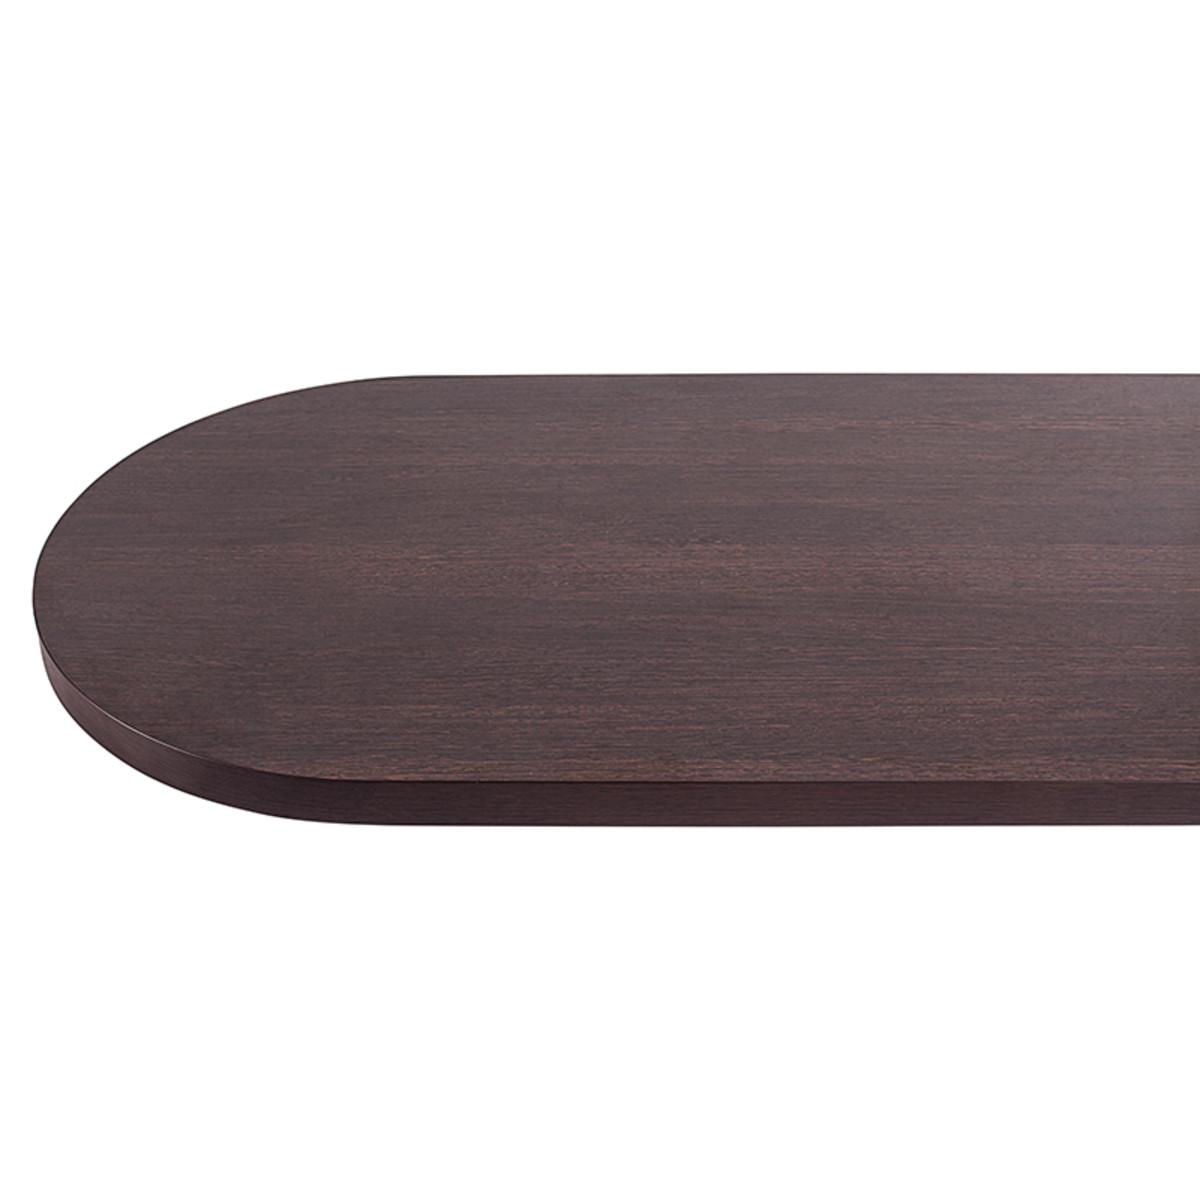 Столешница барная №1 150х3.8х60 см ЛДСП/пластик цвет венге